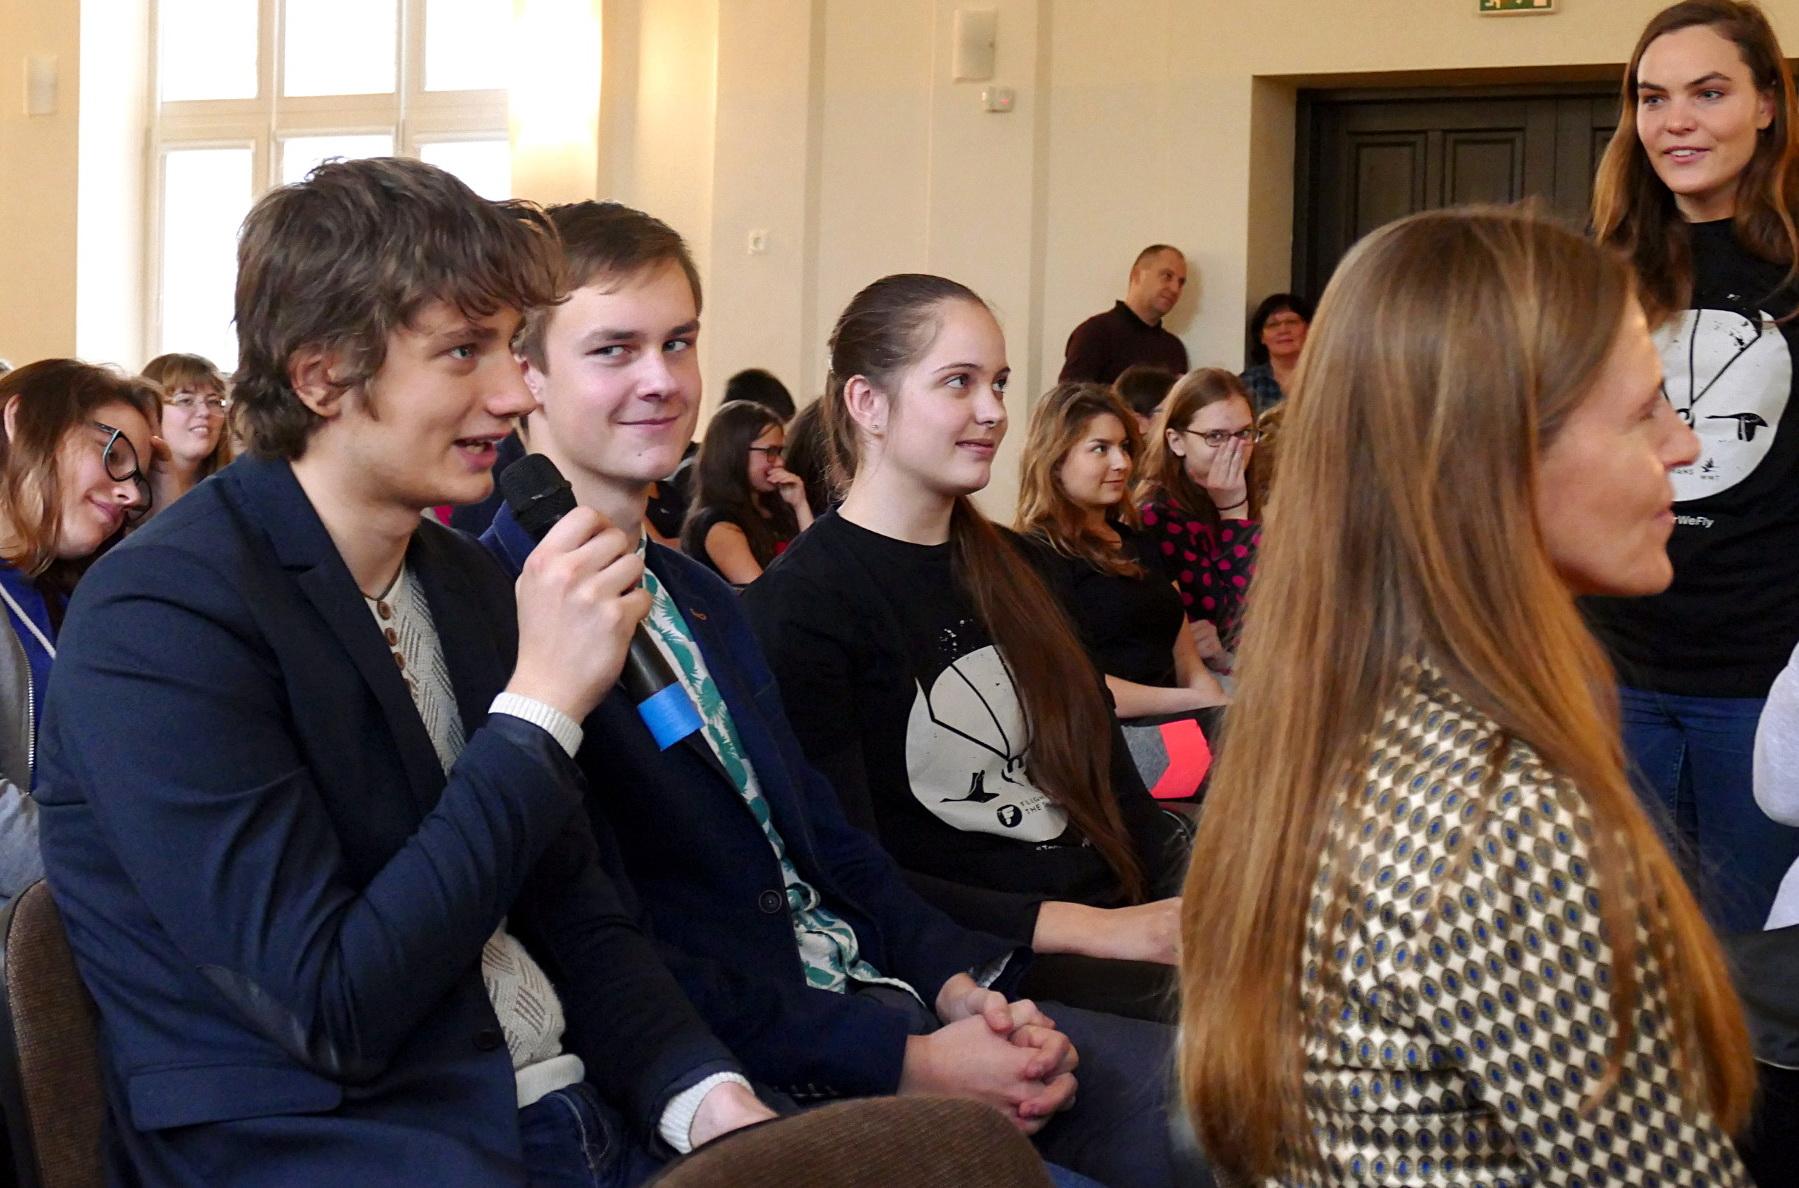 Vydūno gimnazijos gimnazistai su Latvijoje buvusia Sacha Dench bendravo internetu.